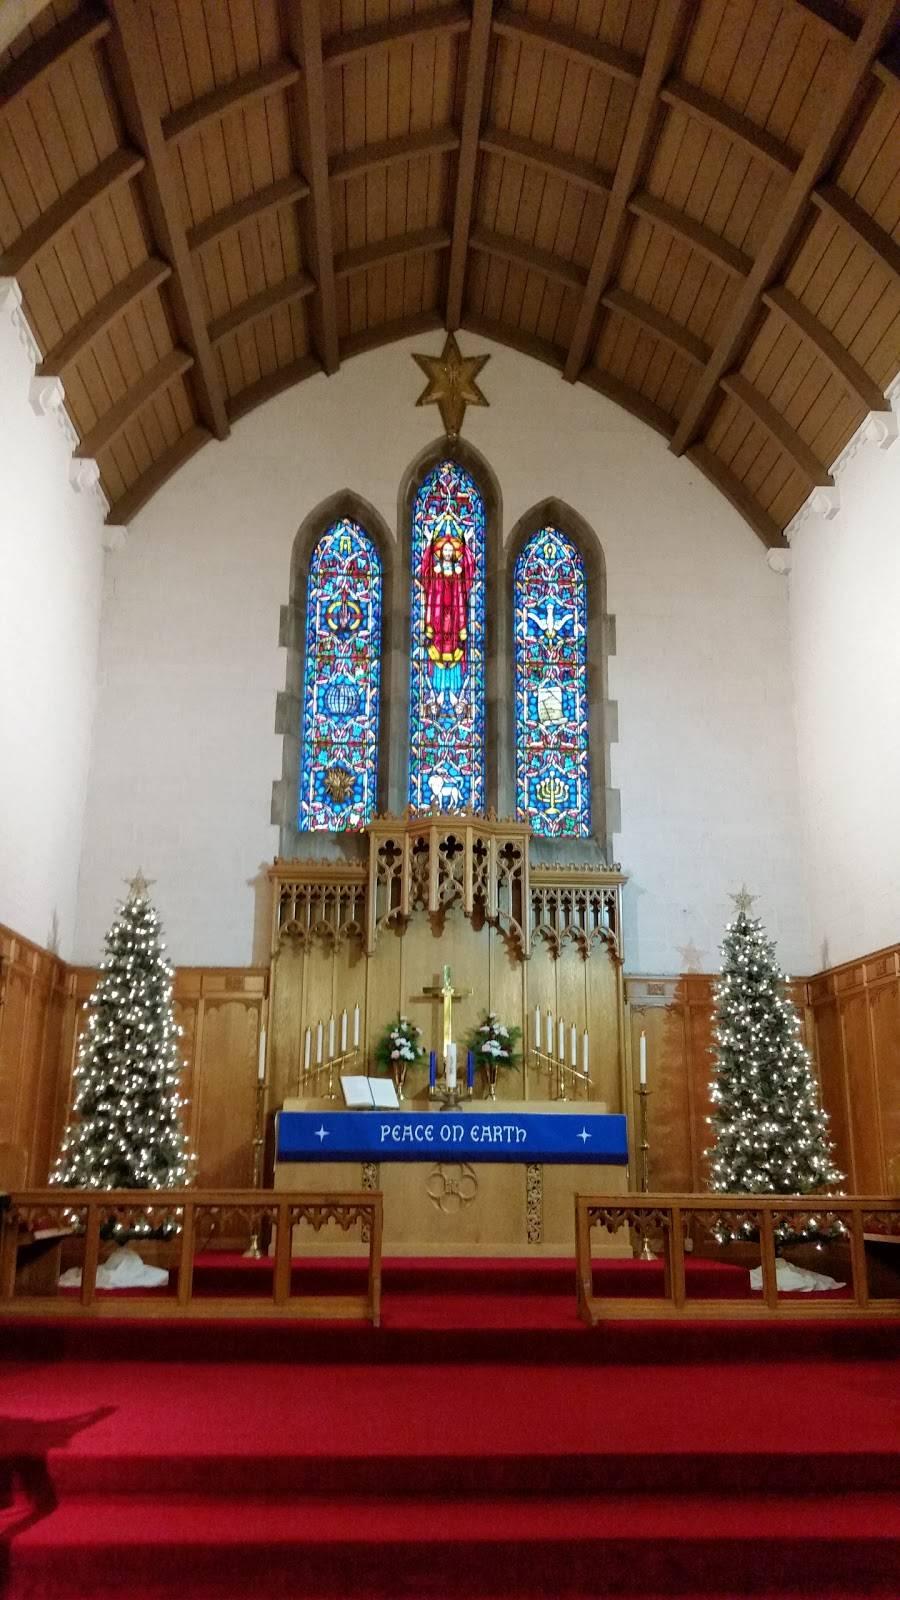 Bethel Lutheran Church - church    Photo 2 of 3   Address: 1853 South Ave # 2, Toledo, OH 43609, USA   Phone: (419) 385-5339